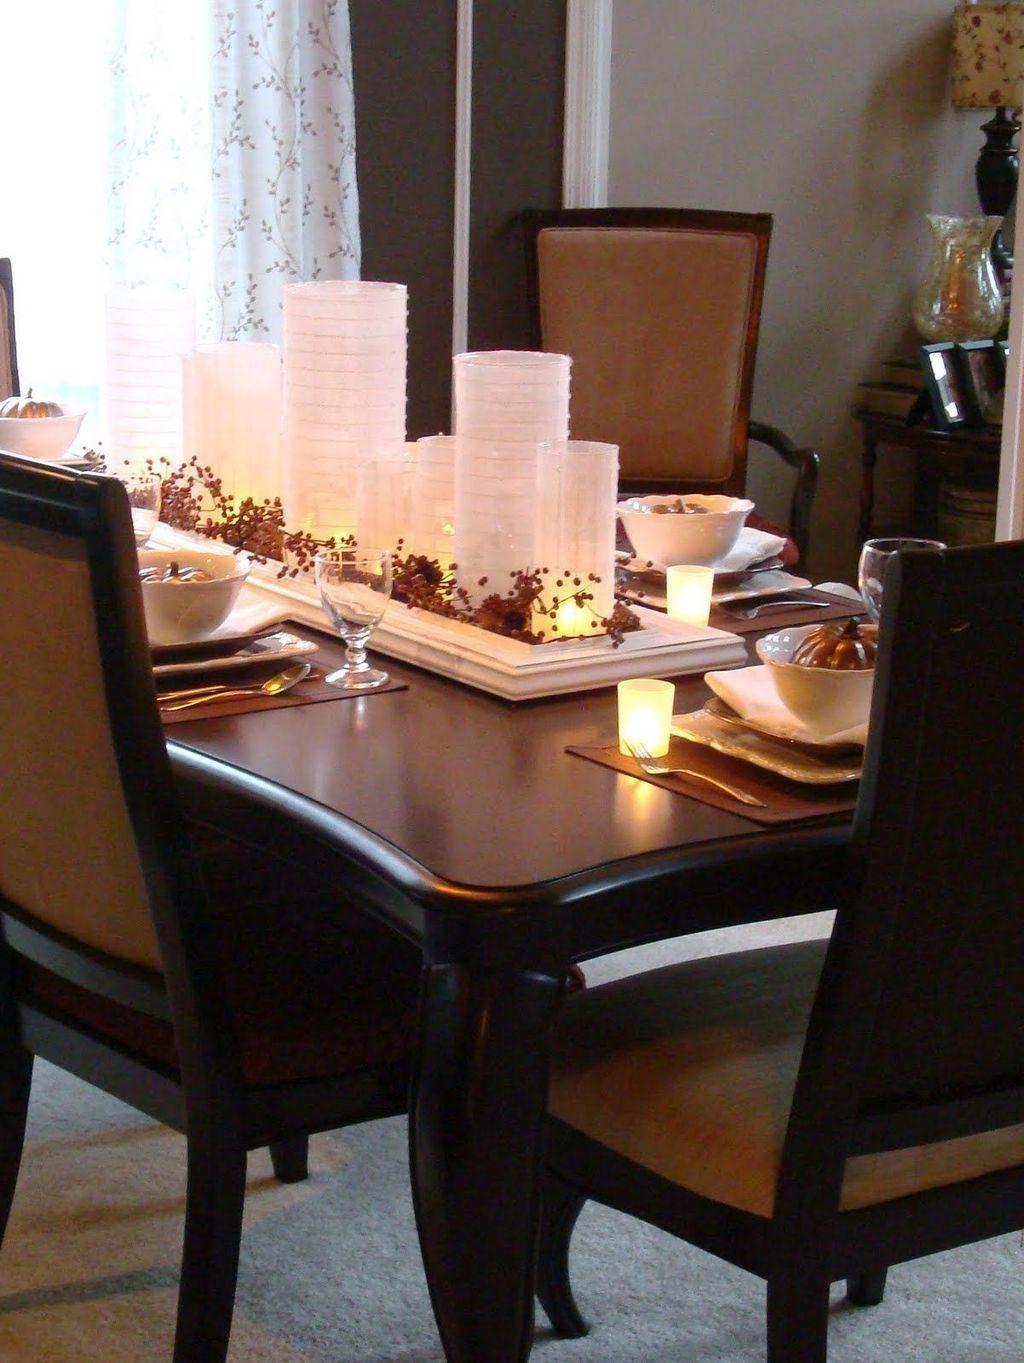 20 Modern Diy Fall Centerpiece Ideas For Your Home Decor Dining Room Table Decor Dining Room Table Centerpieces Dining Room Centerpiece